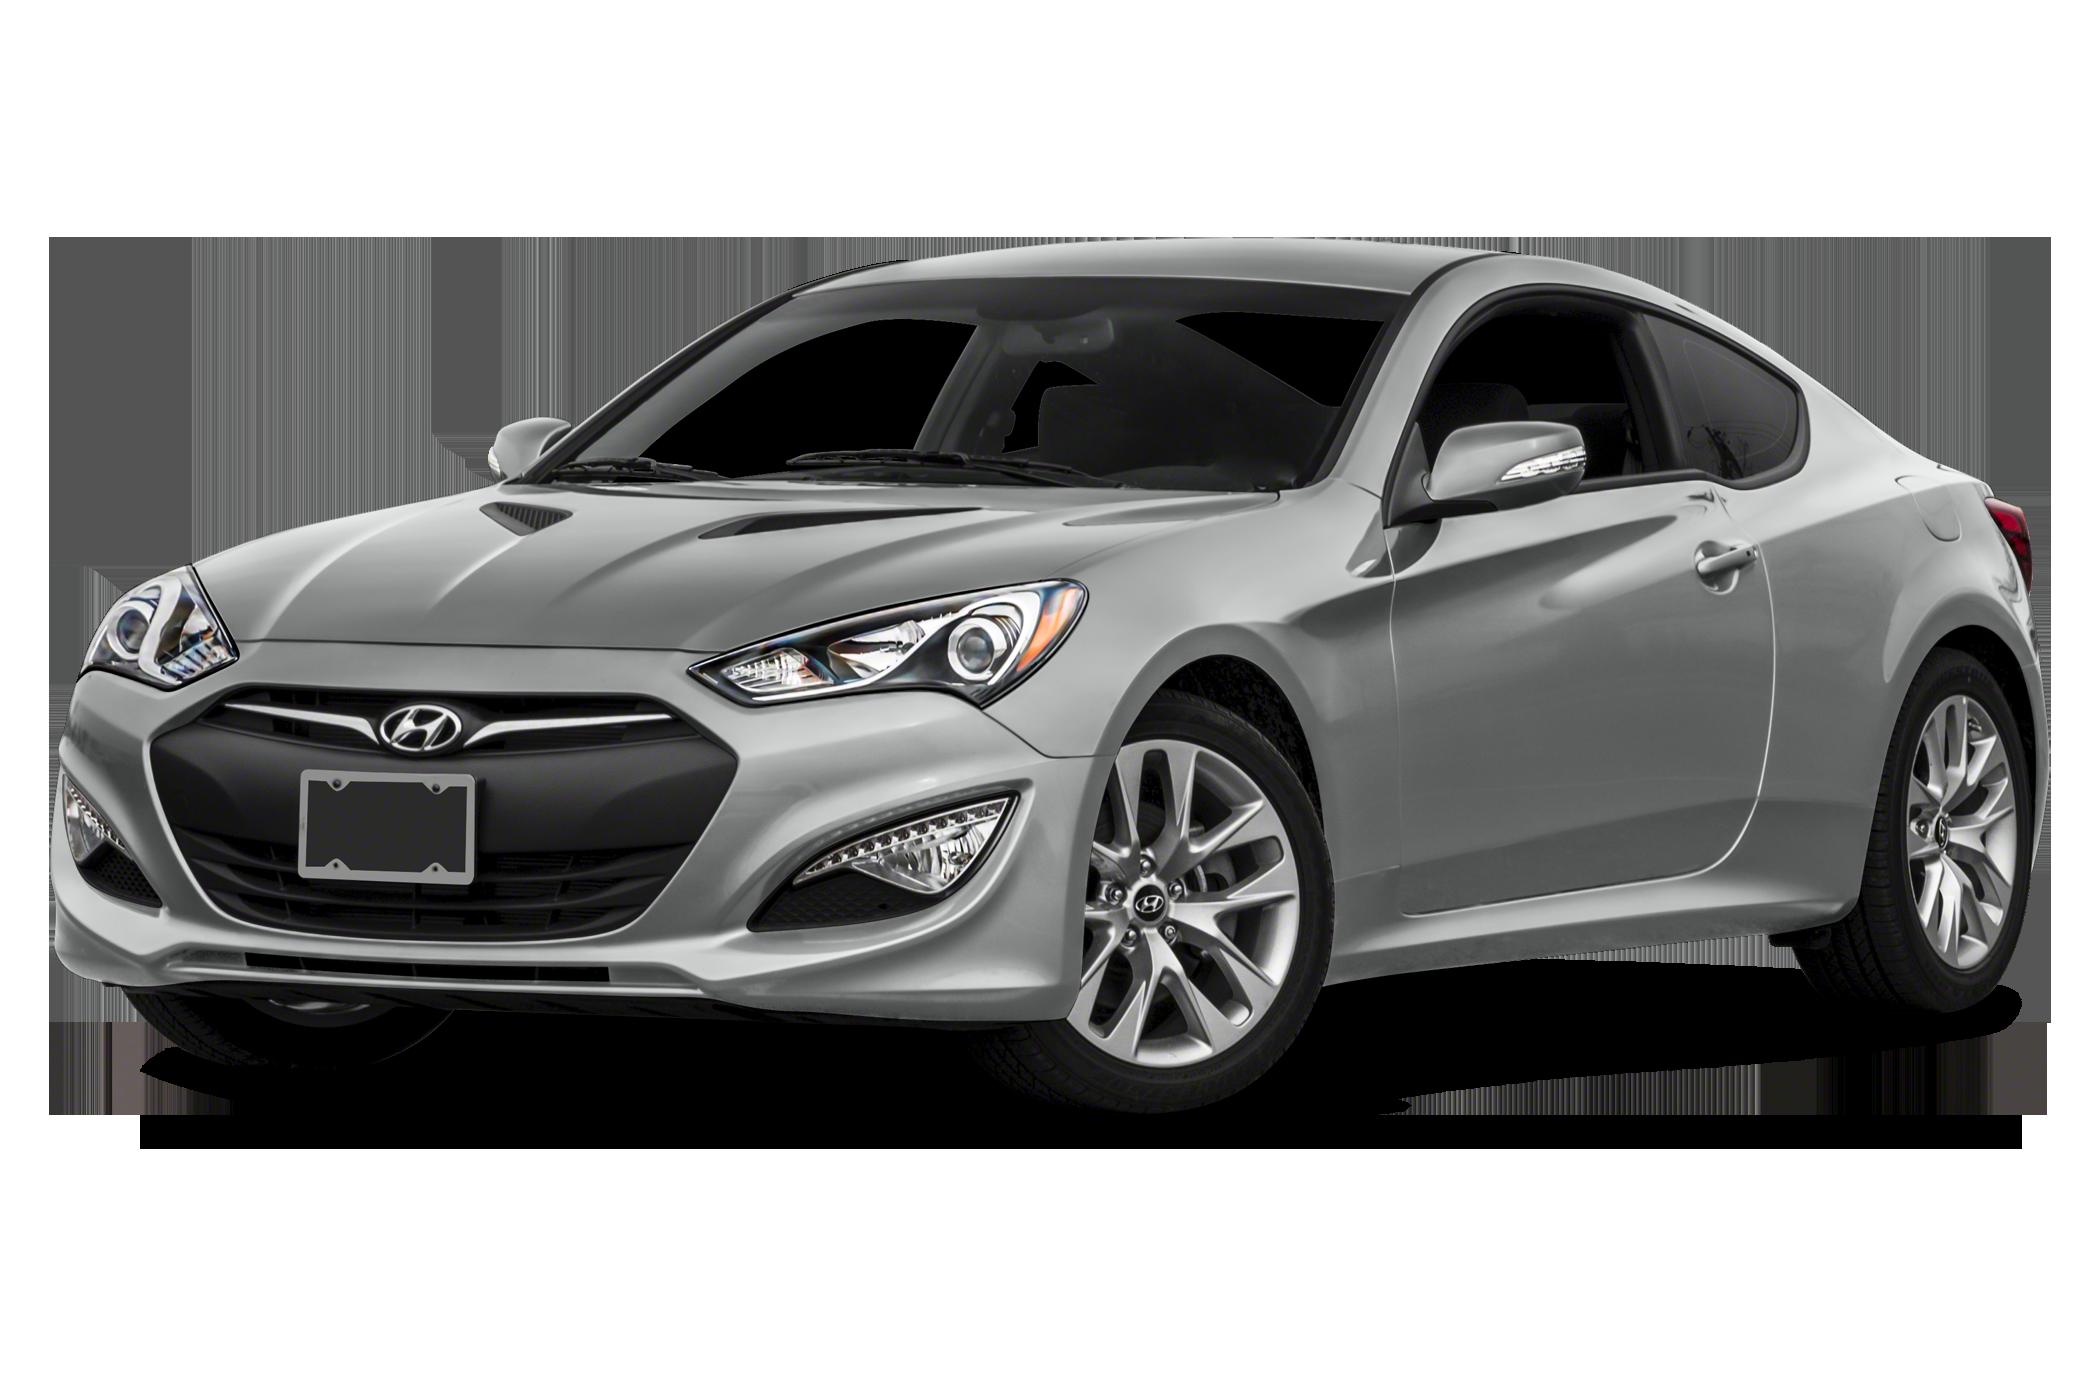 2016 Hyundai Genesis Coupe - View Specs, Prices & Photos ...